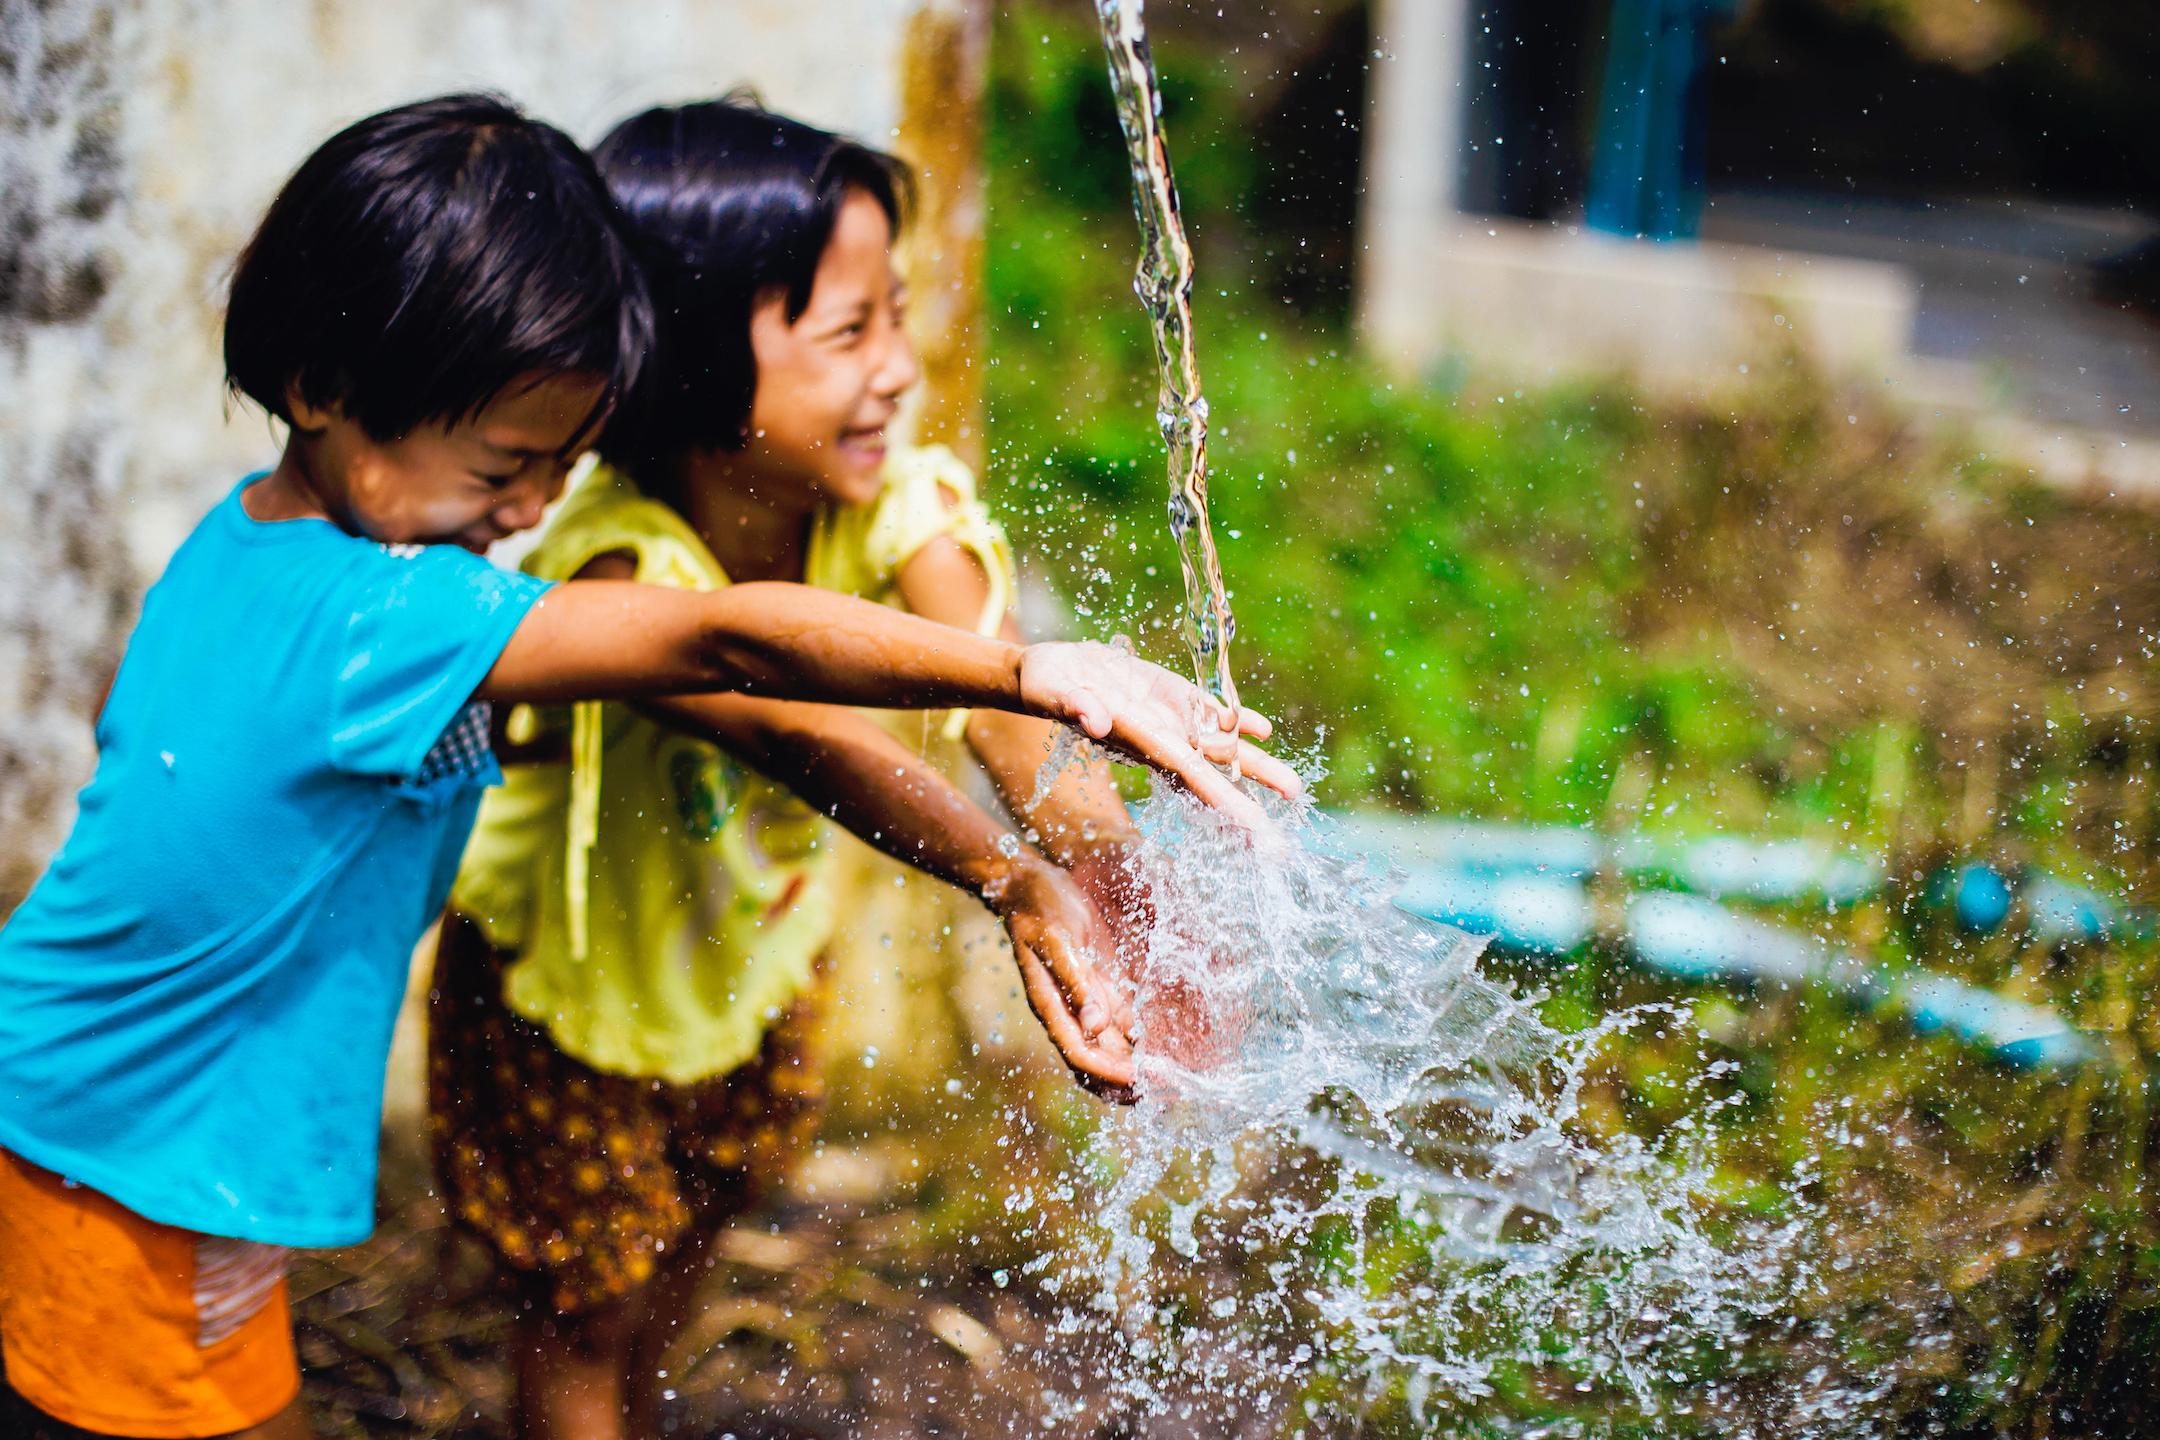 2 Children Water Splashing on Hands_pexels-photo-473408